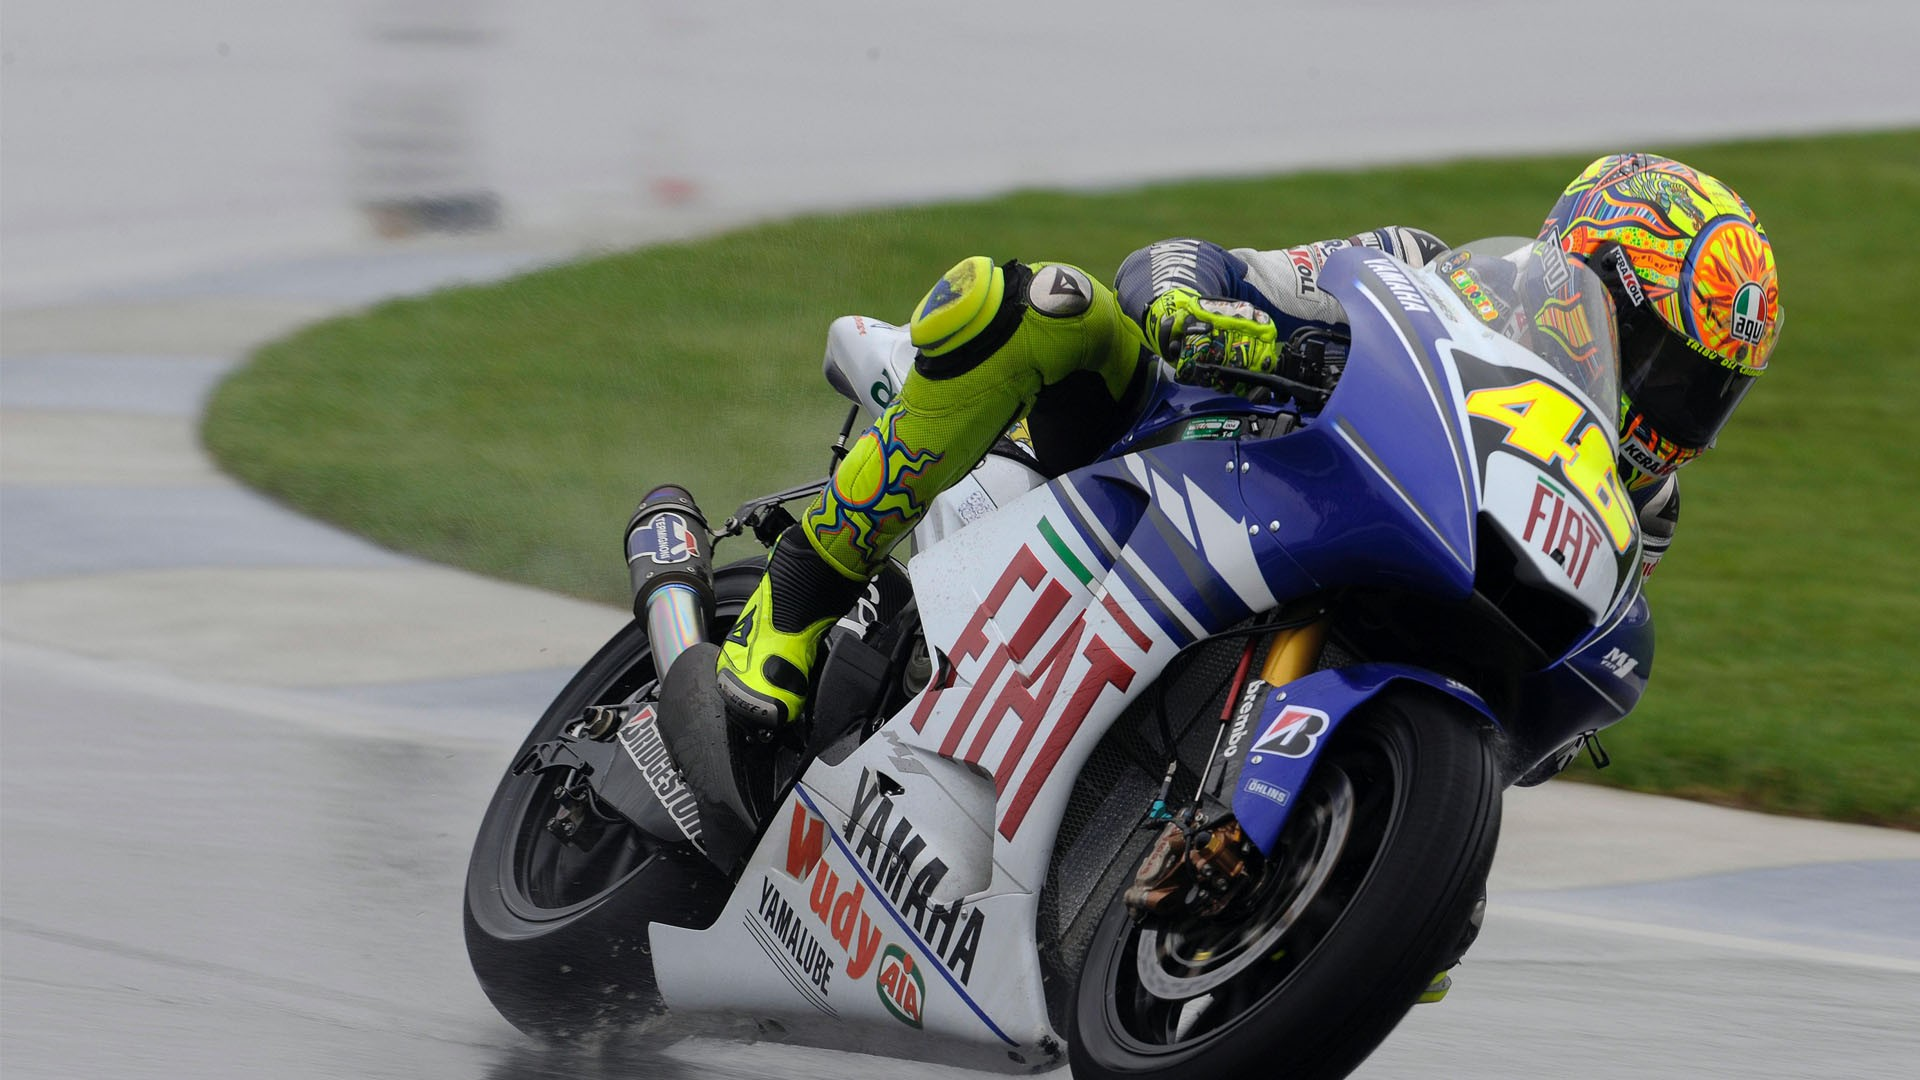 MotoGP Wallpapers HD 1080px   HD Wallpaper Desktop Background 1920x1080